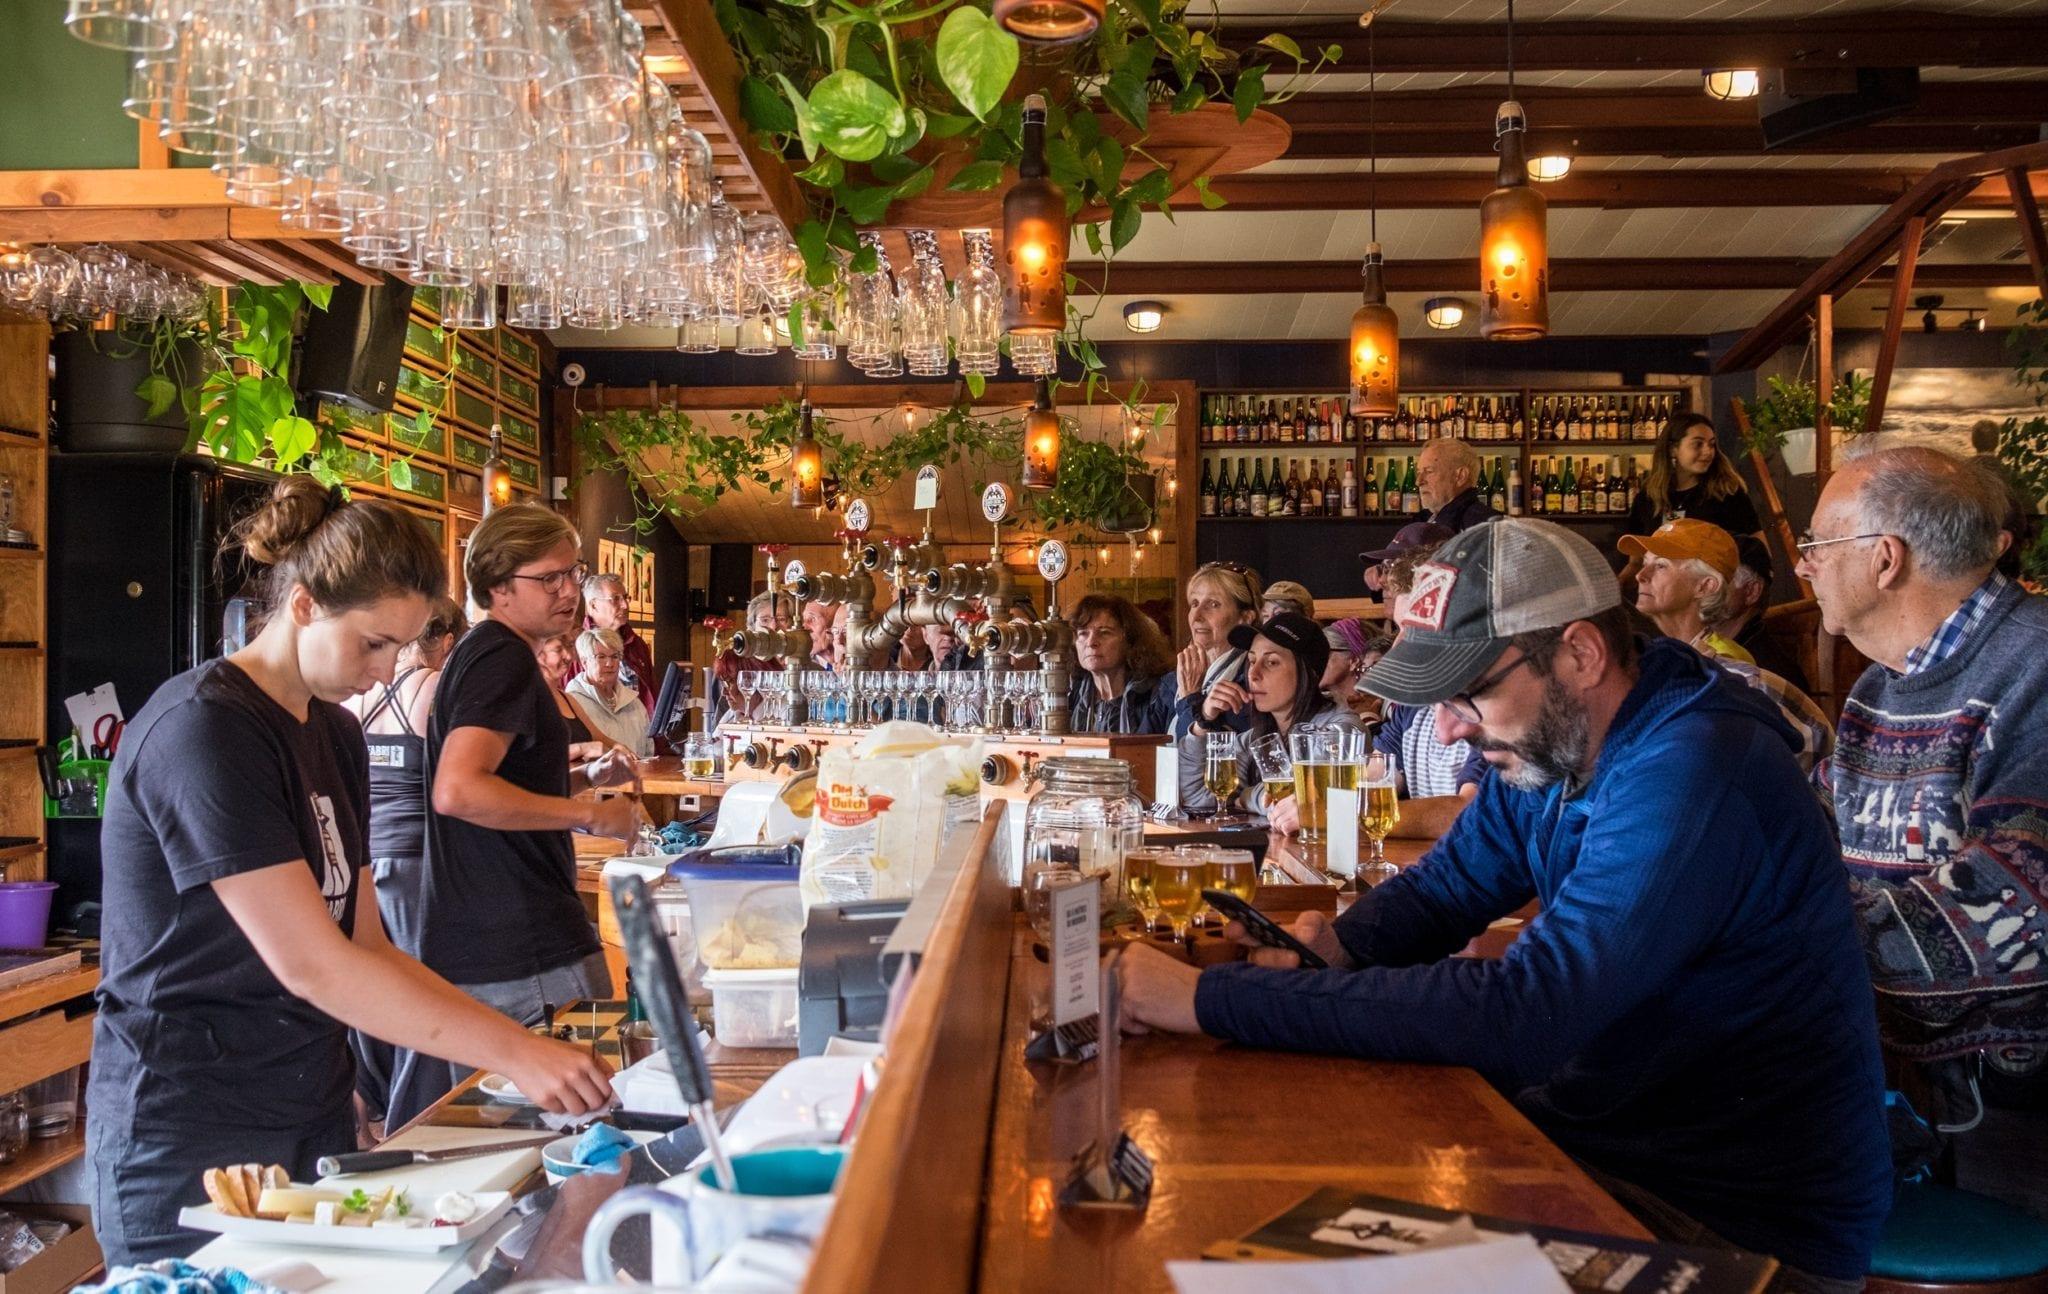 Bartenders serve beer to patrons at L'abri de la Tempete brewery in the Iles-de-la-Madeleine.